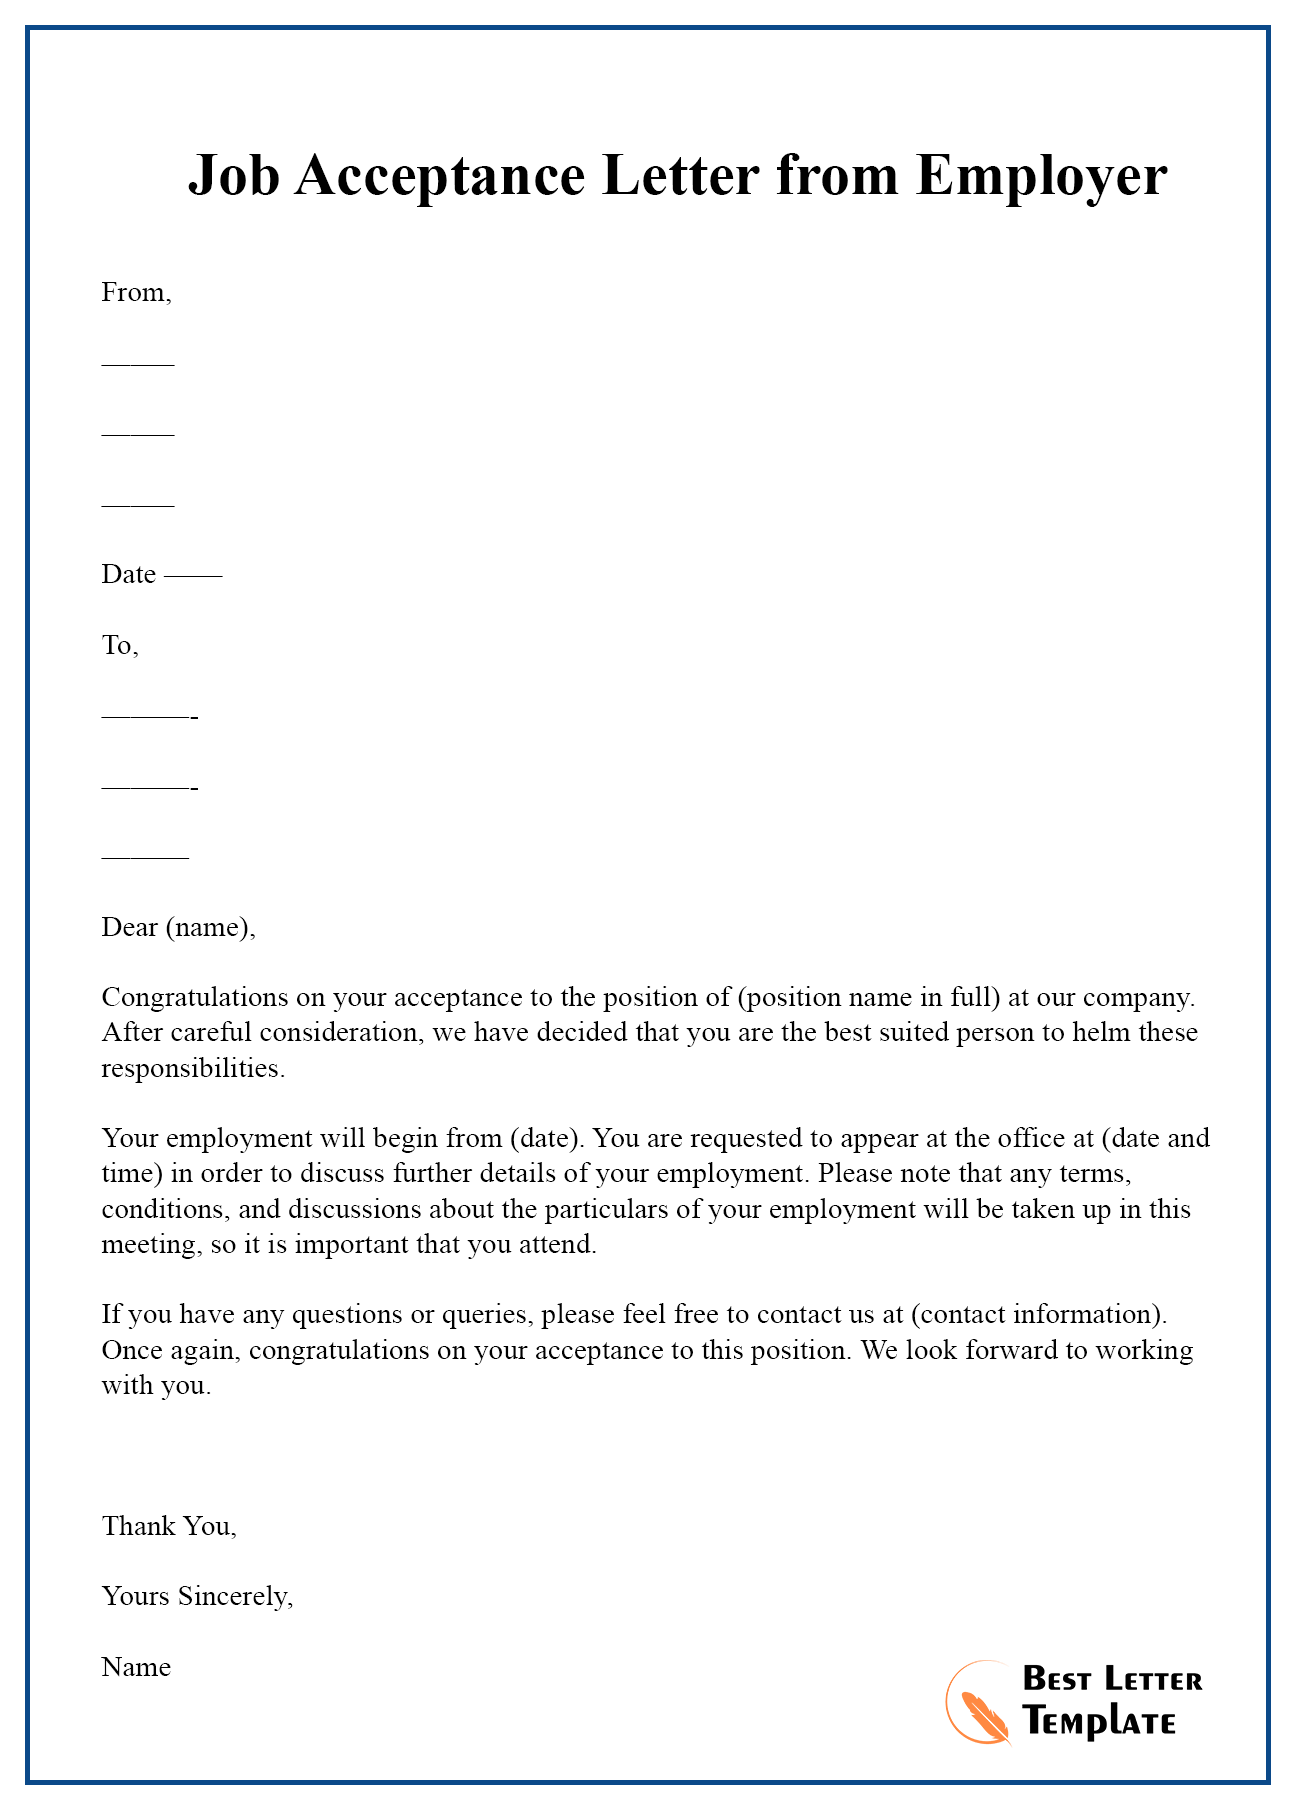 Letter Of Job Acceptance from bestlettertemplate.com